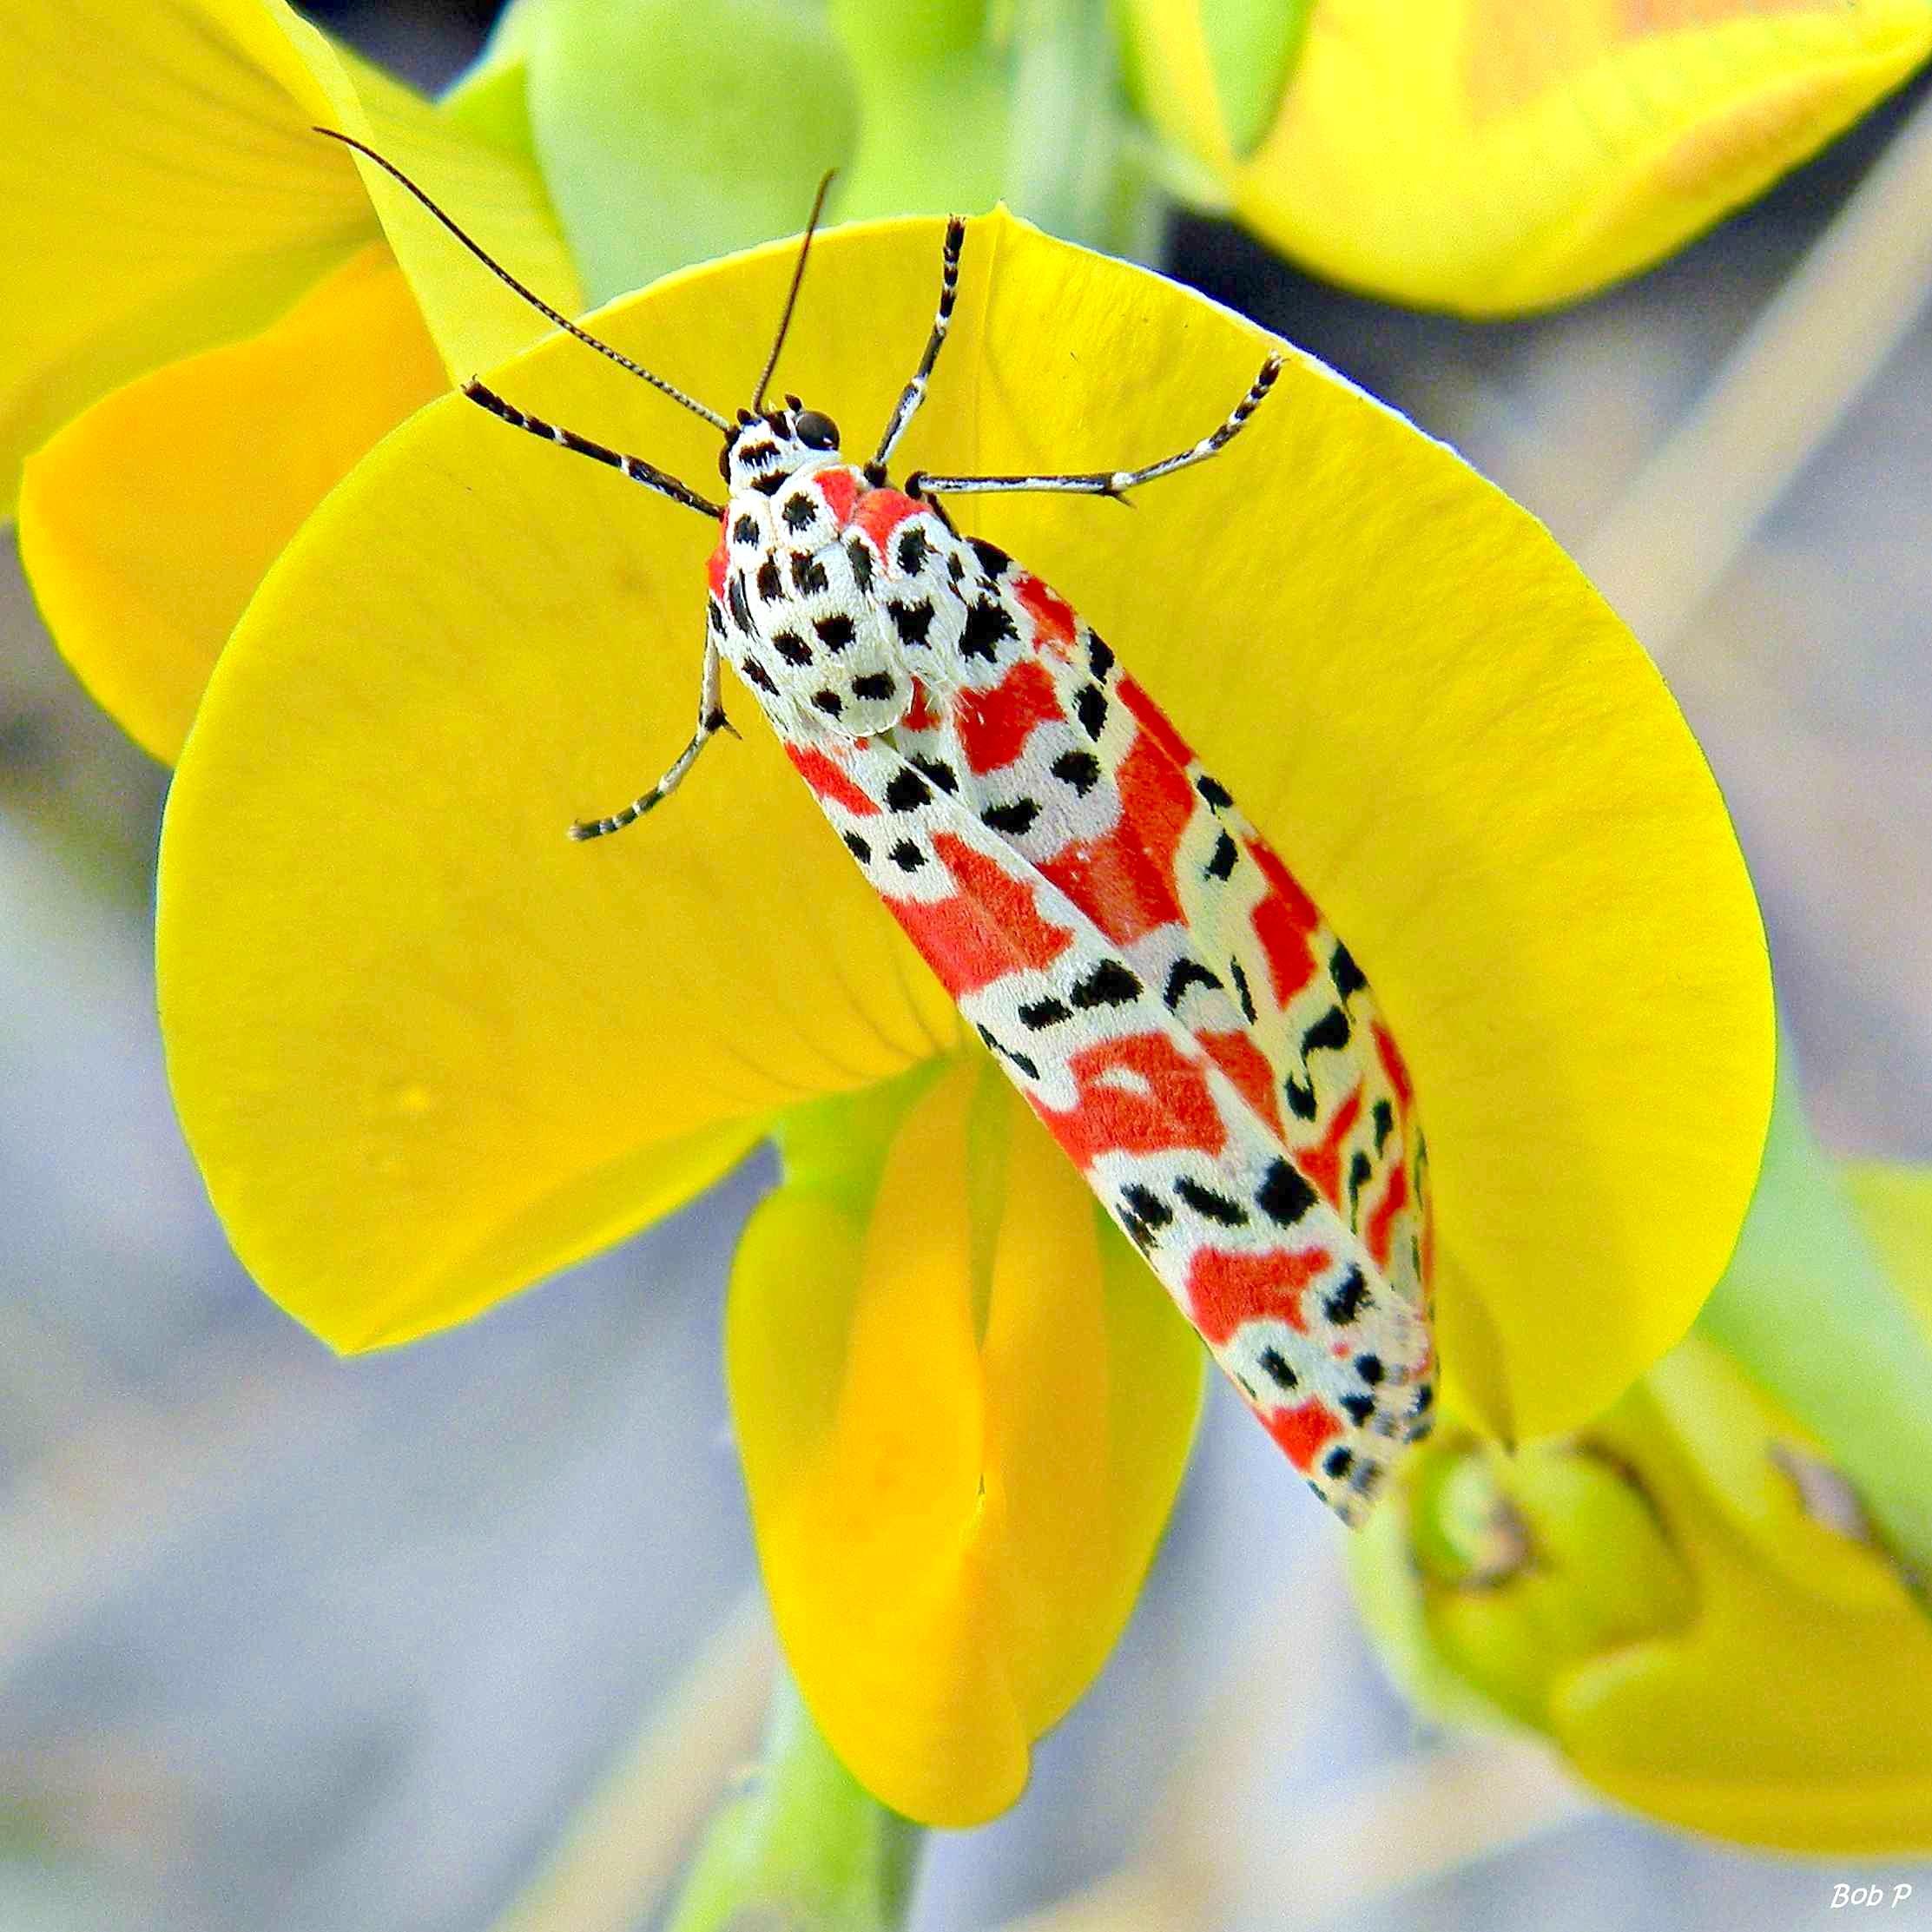 Day-flying_Bella_Moth_(Utetheisa_ornatrix) on Rattlebox Blossom (Bob Peterson, Florida)